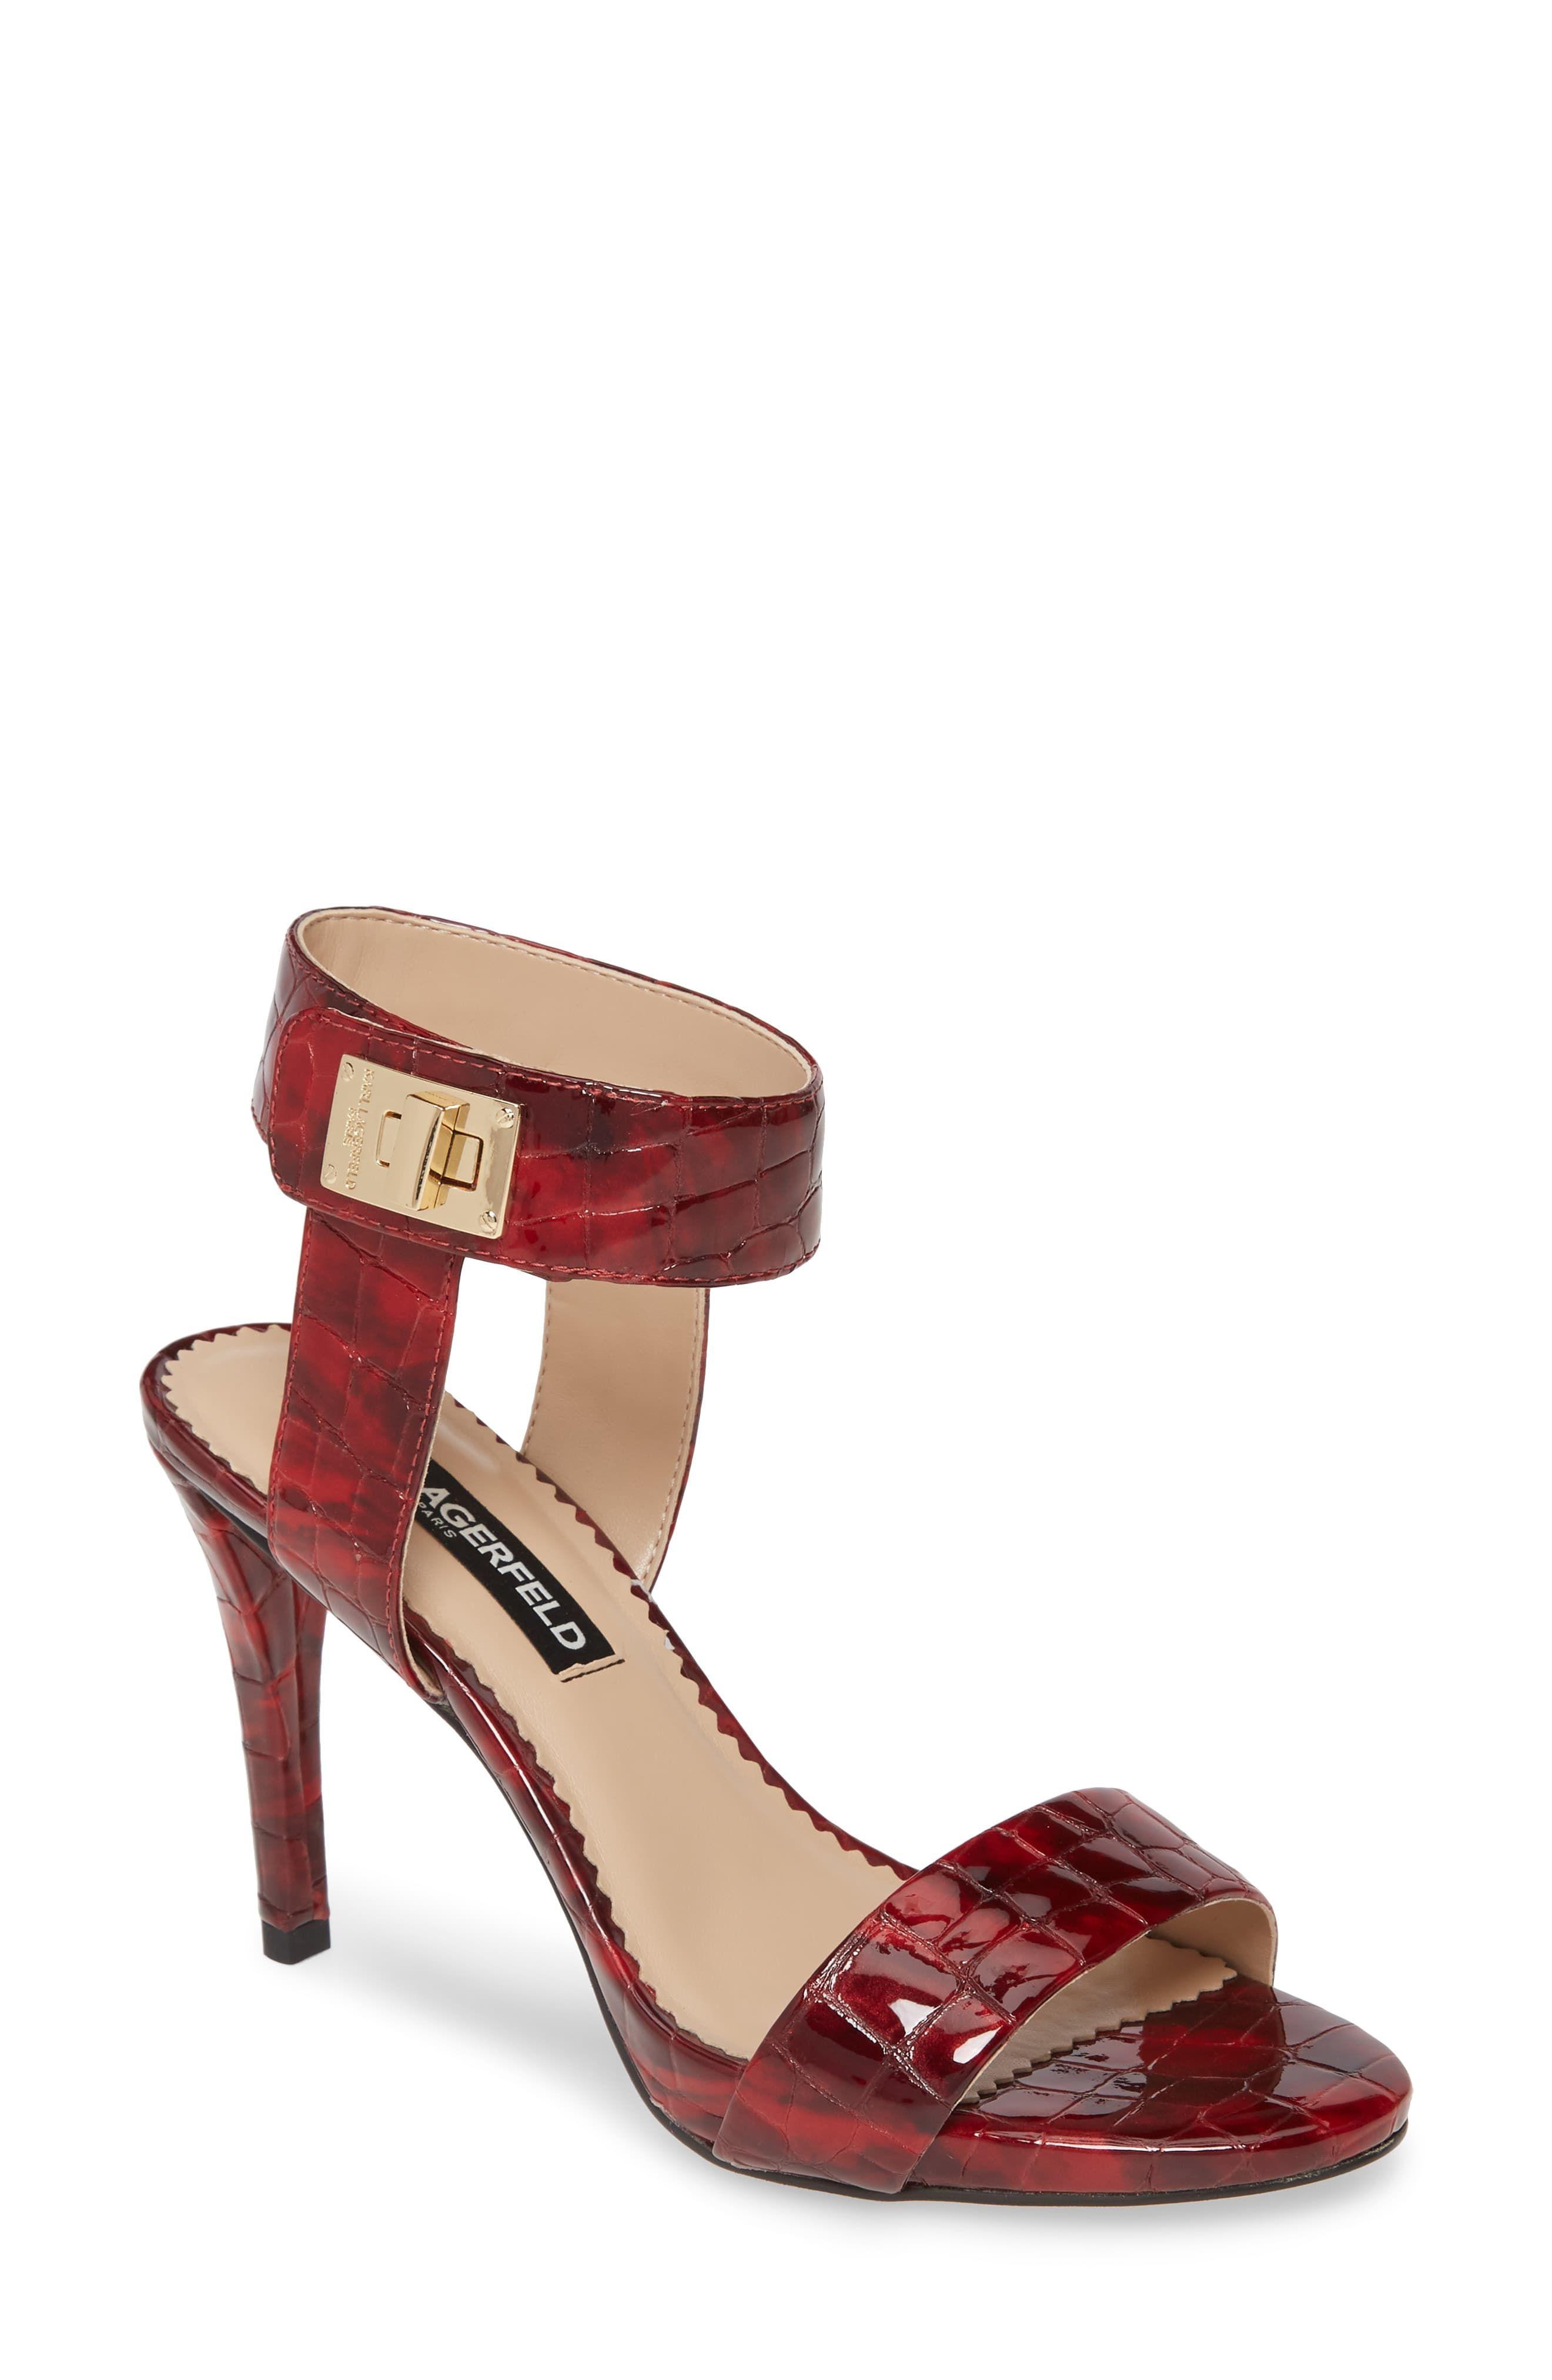 Women's Karl Lagerfeld Paris Olivia Ankle Strap Sandal, Size